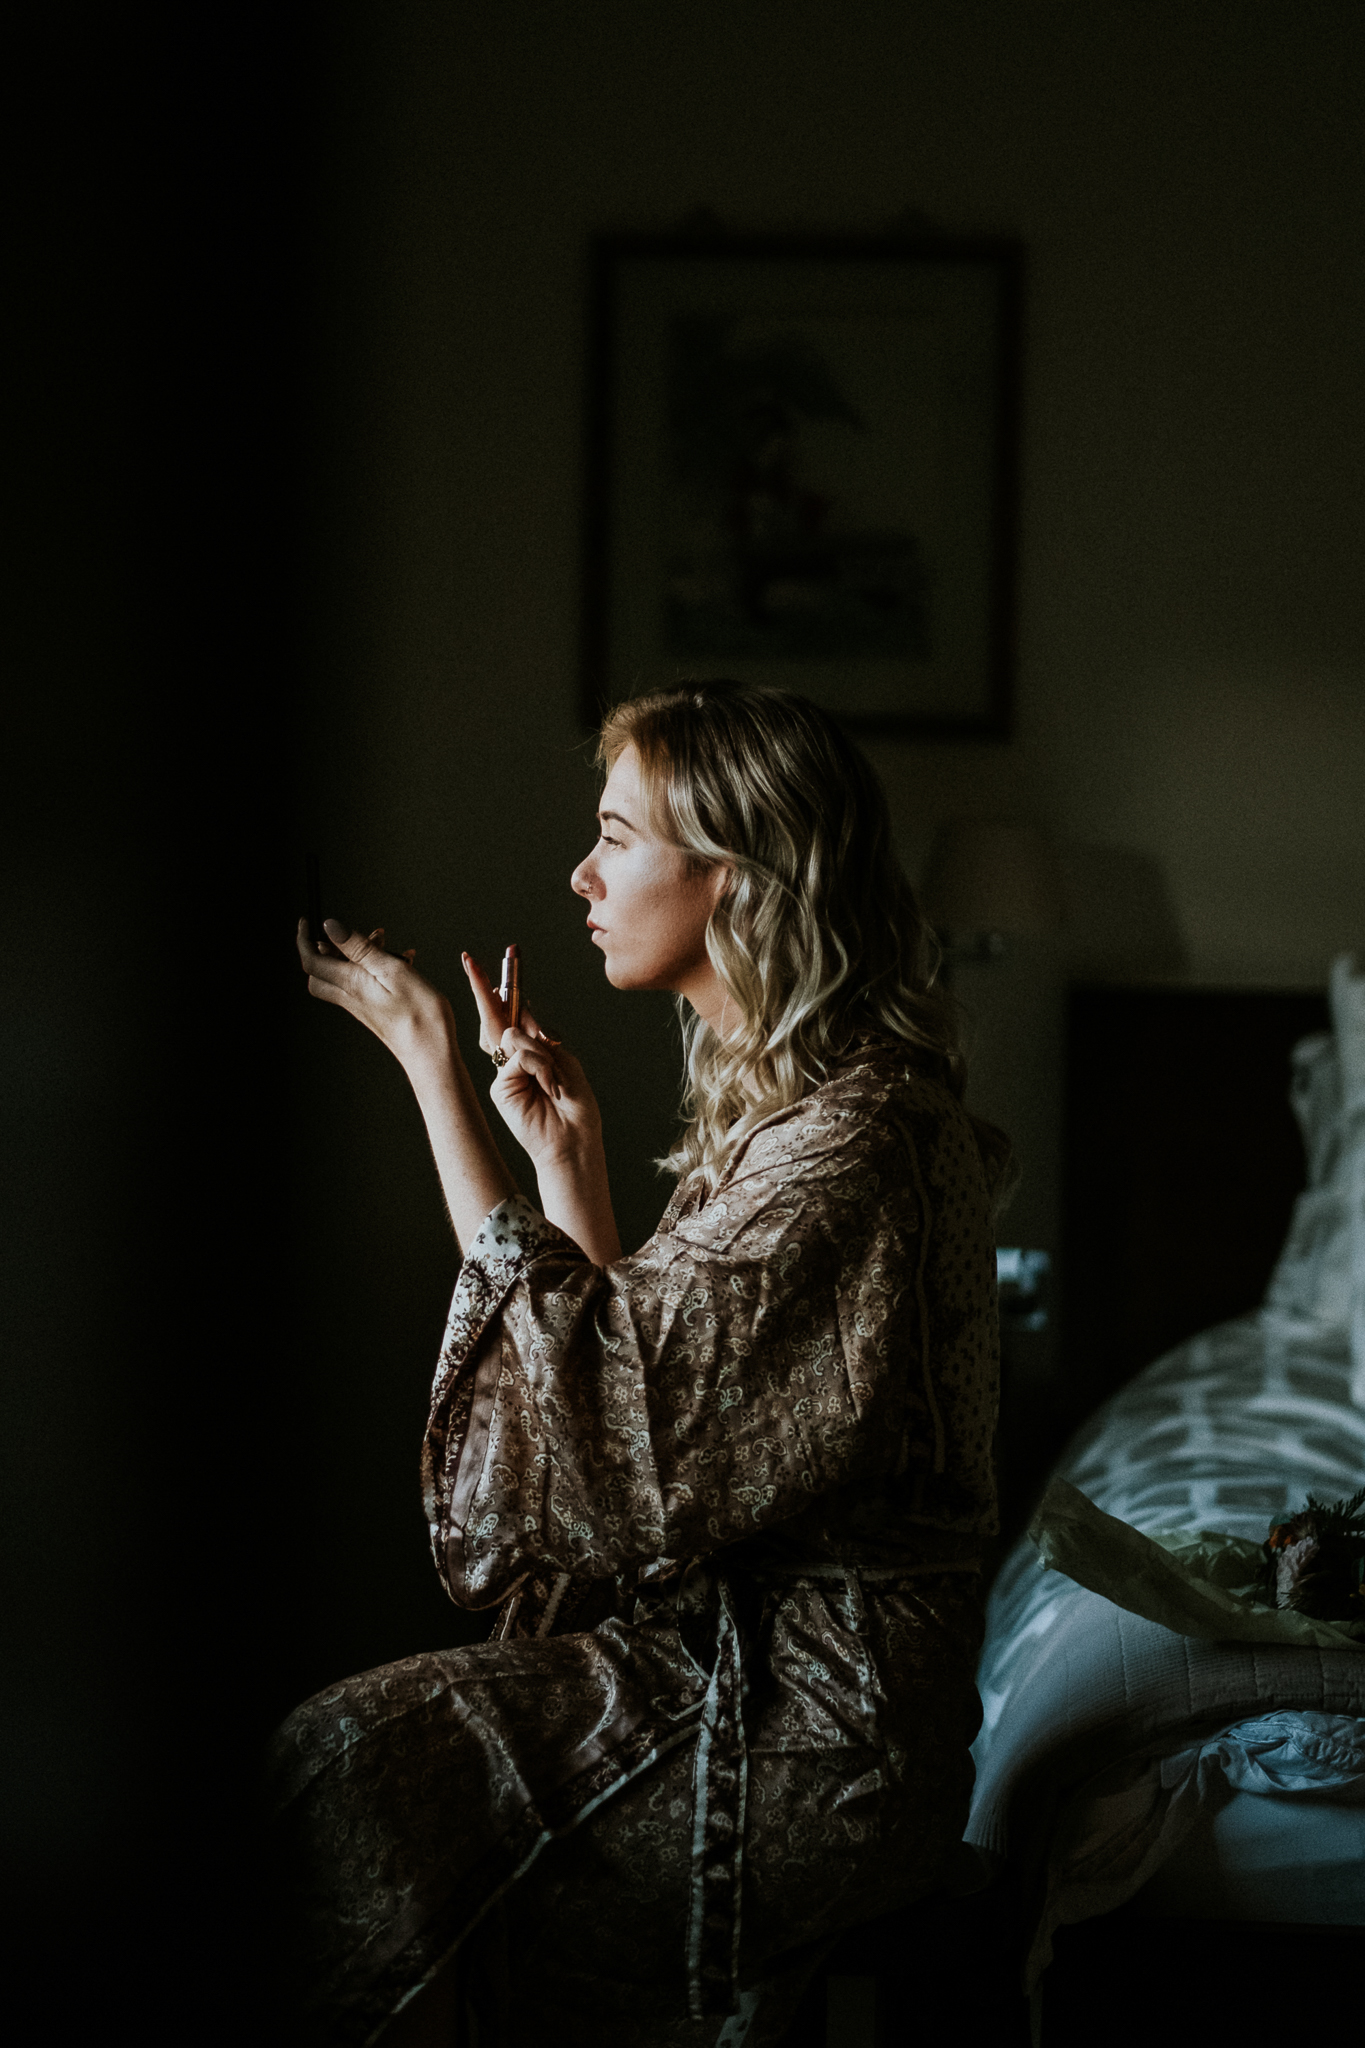 64 Cuckmere Haven Engagement shoot alternative wedding photographer Joanna Nicole Photography1.jpg